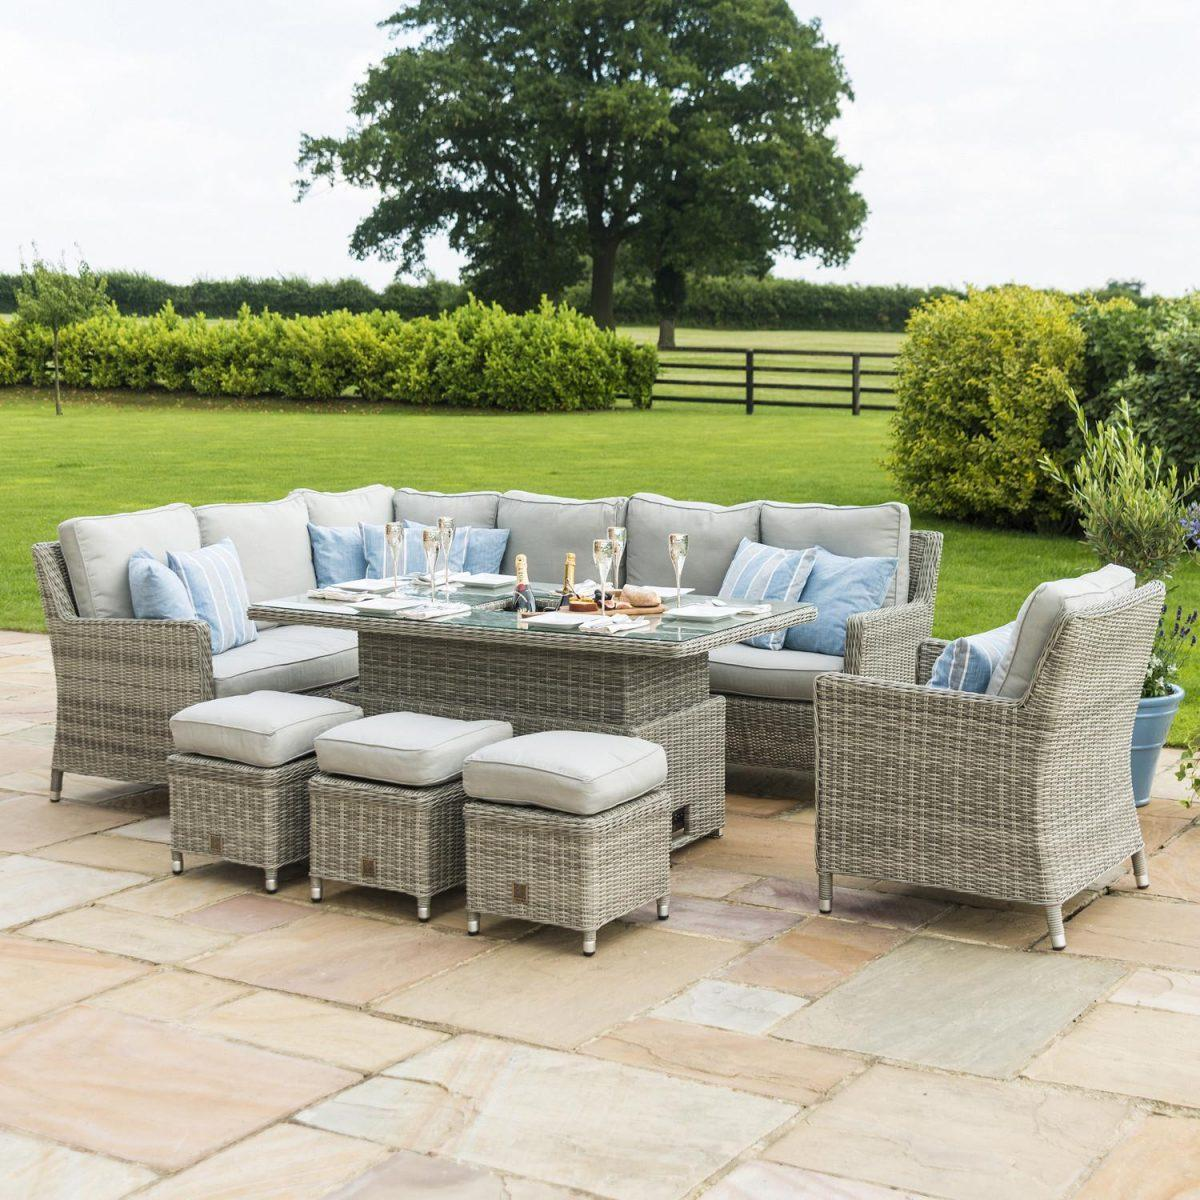 Corner Sofa Dining Set - Rising Ice Bucket Table - Armchair - Grey Polyrattan